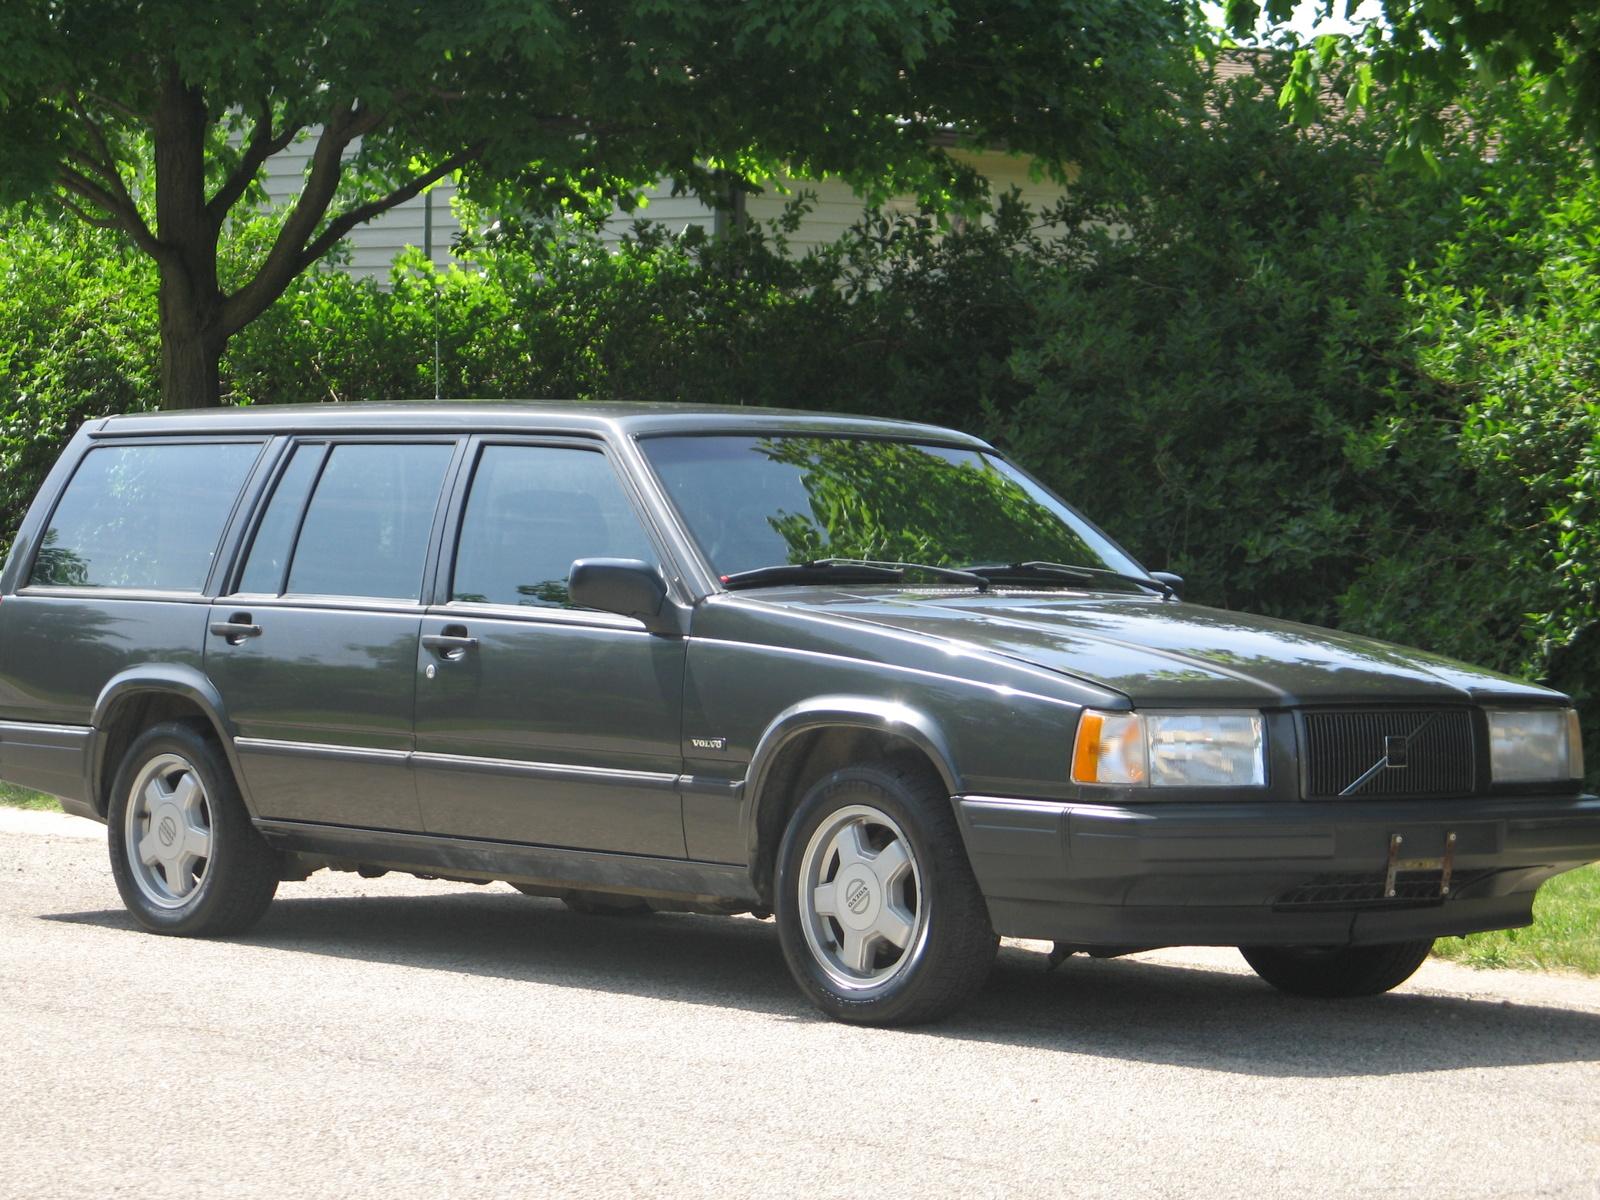 1992 Volvo 740 Turbo Wagon 2018 Volvo Reviews